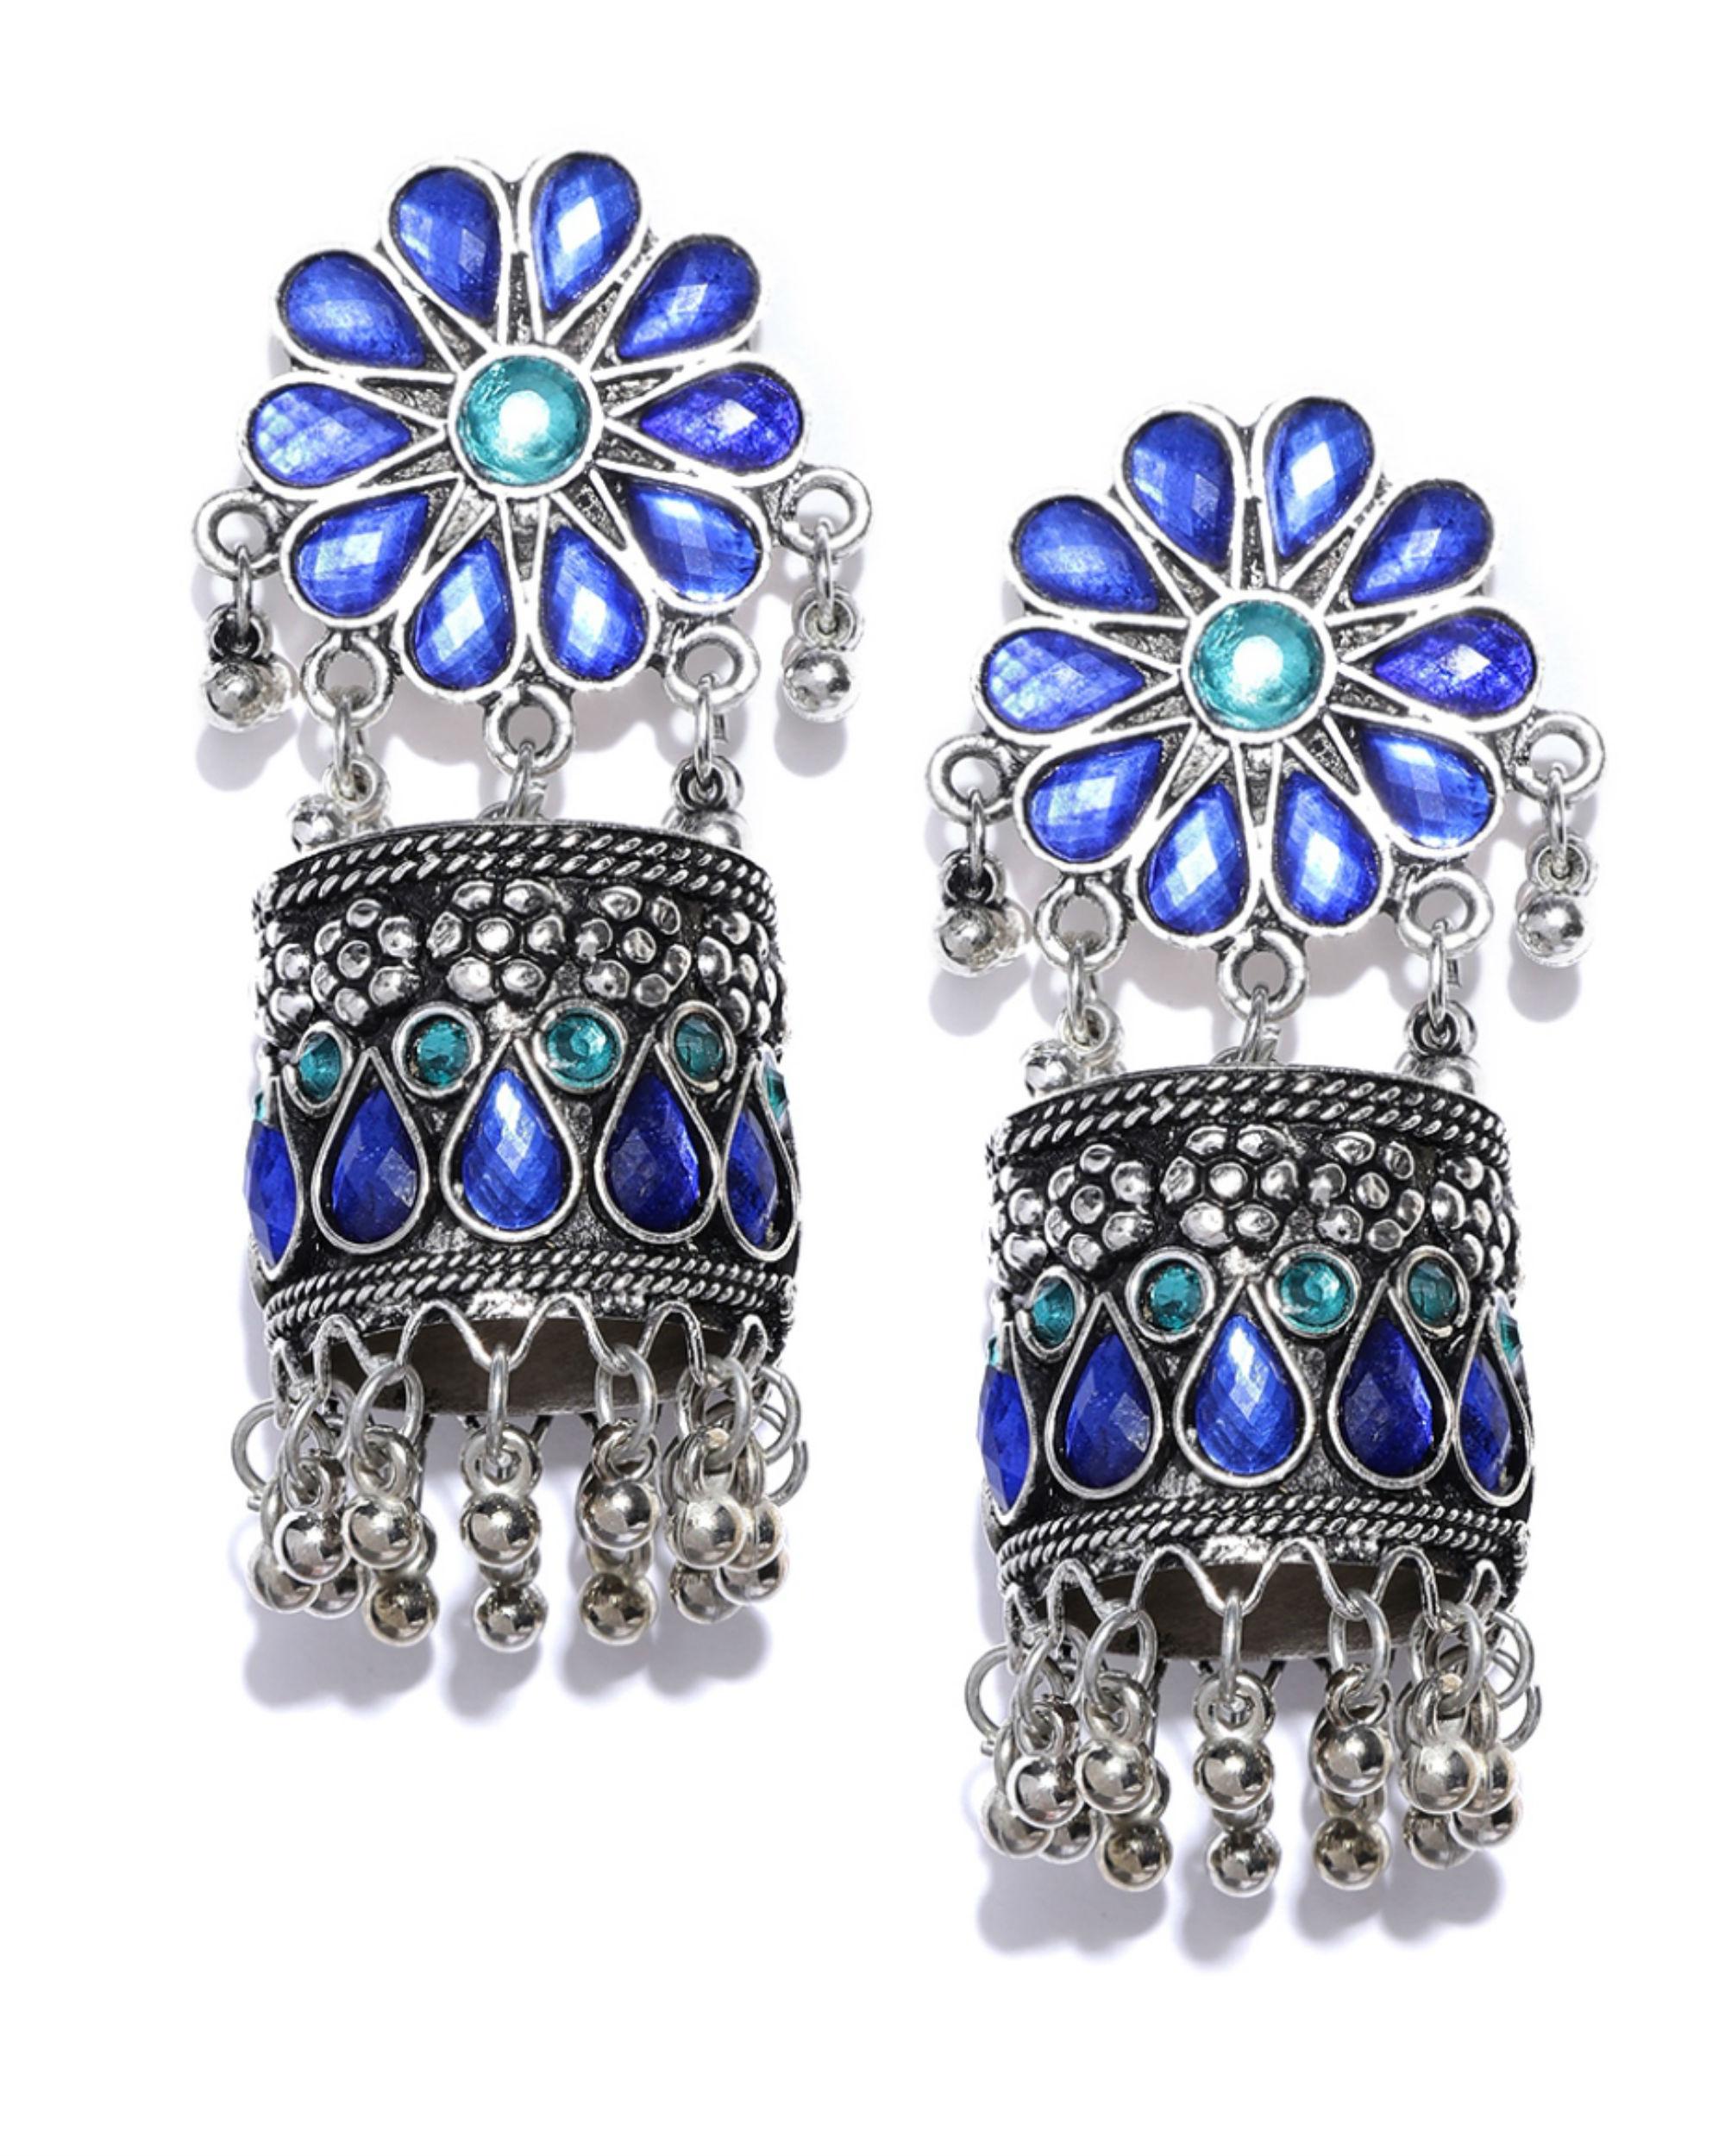 Oxidized silver & blue stone-studded jhumkas